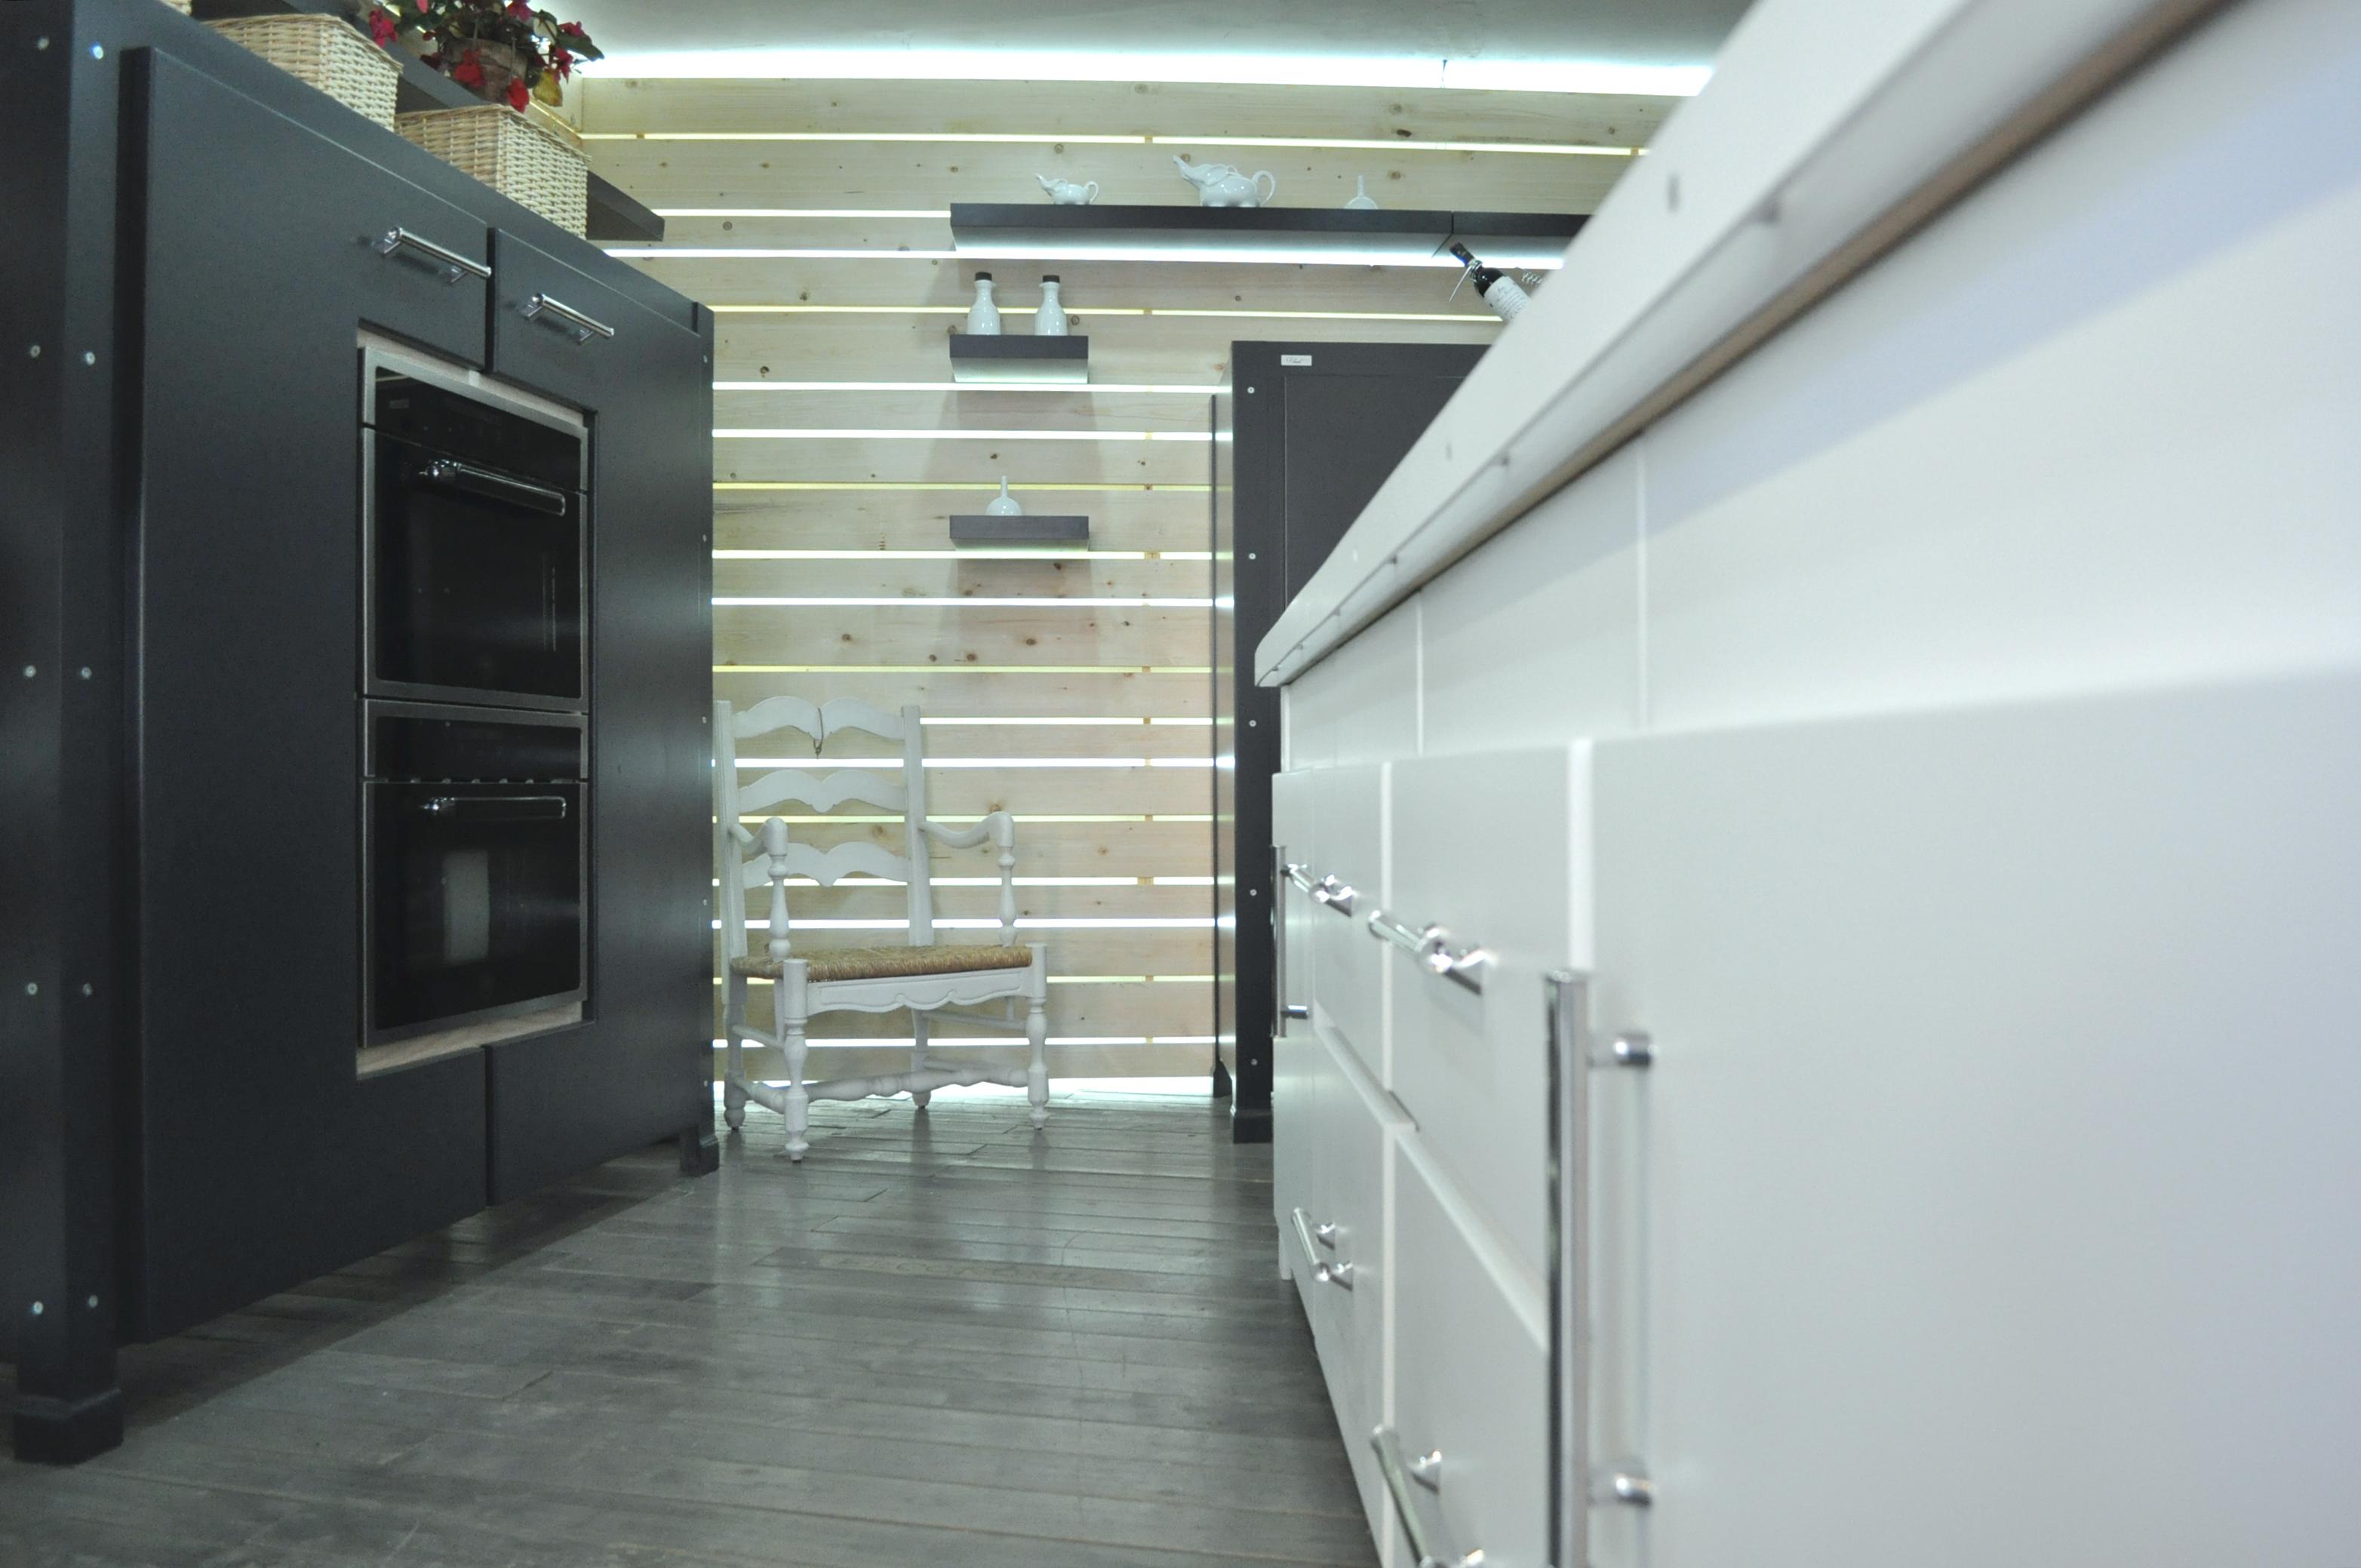 Cucina su misura Industrial-Falegnameria roma_2